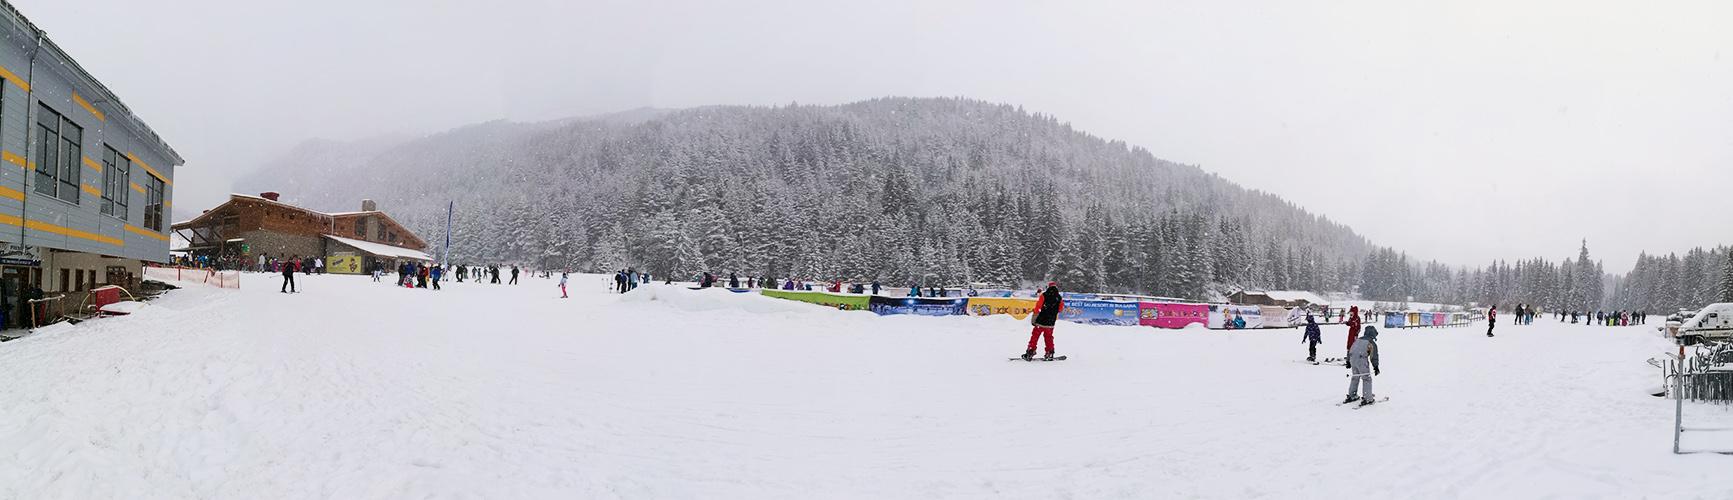 Beginning of the Ski Road